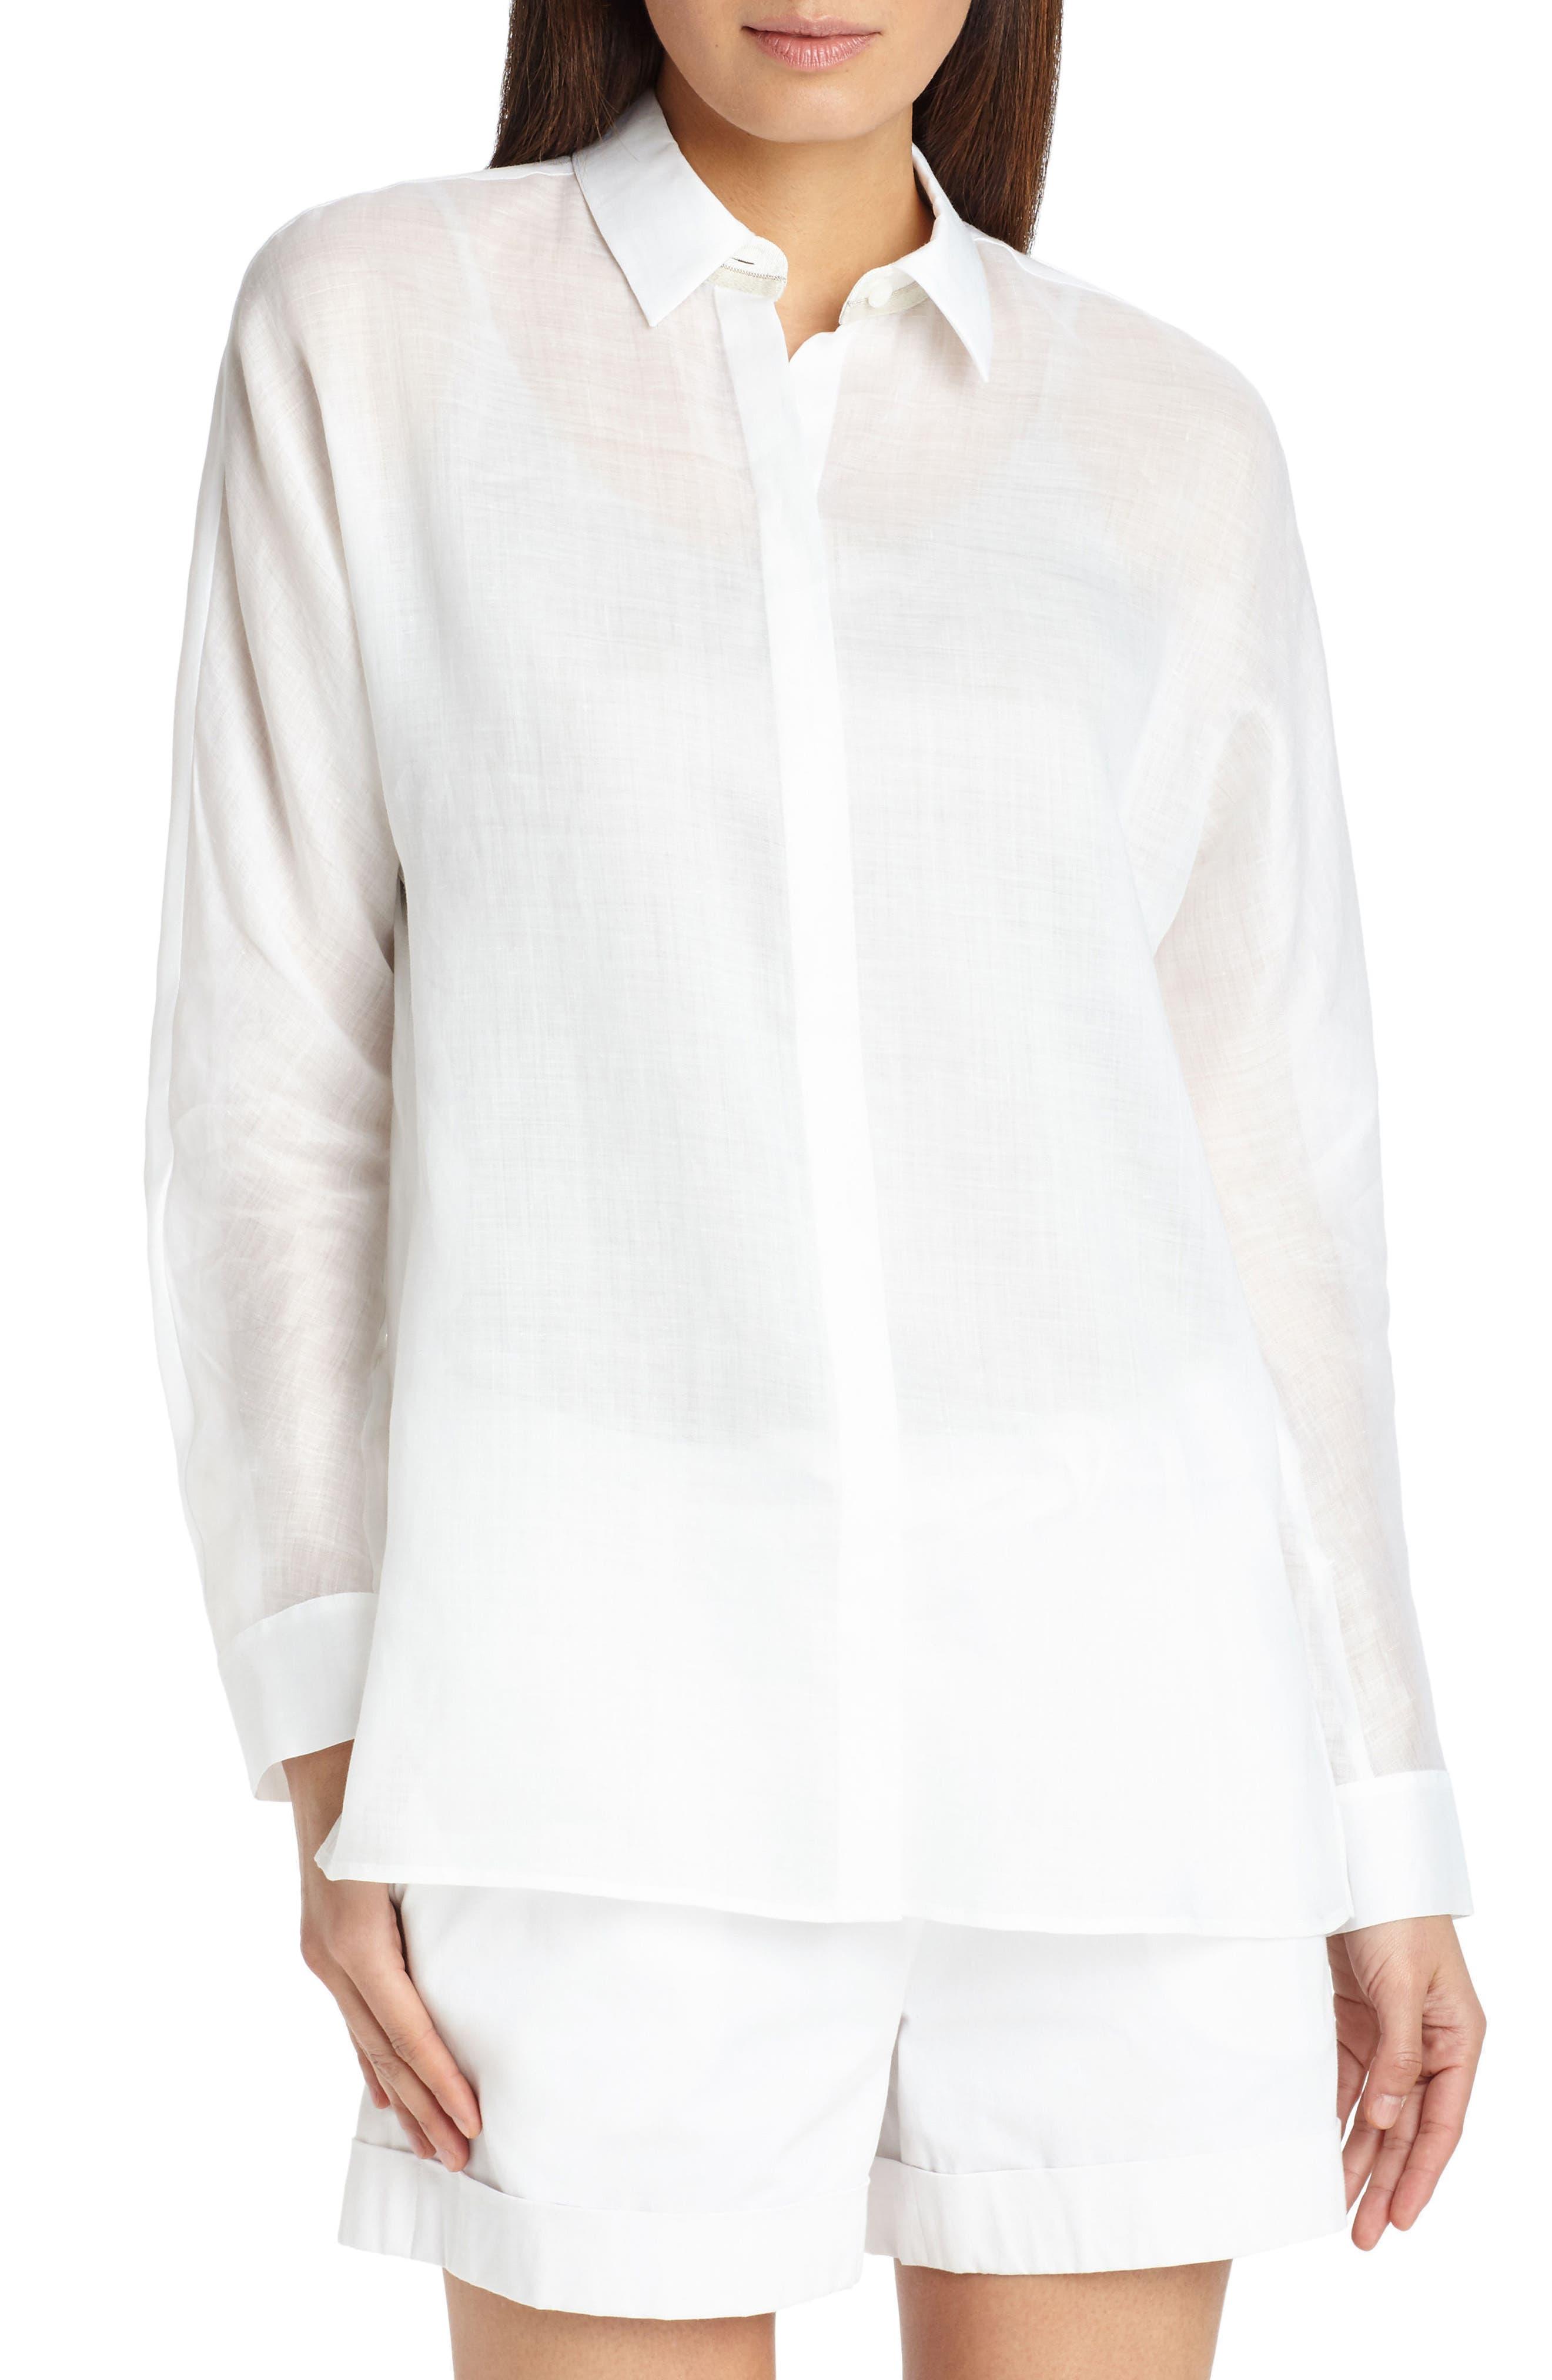 Alyssa Gemma Cloth Blouse,                             Main thumbnail 1, color,                             White